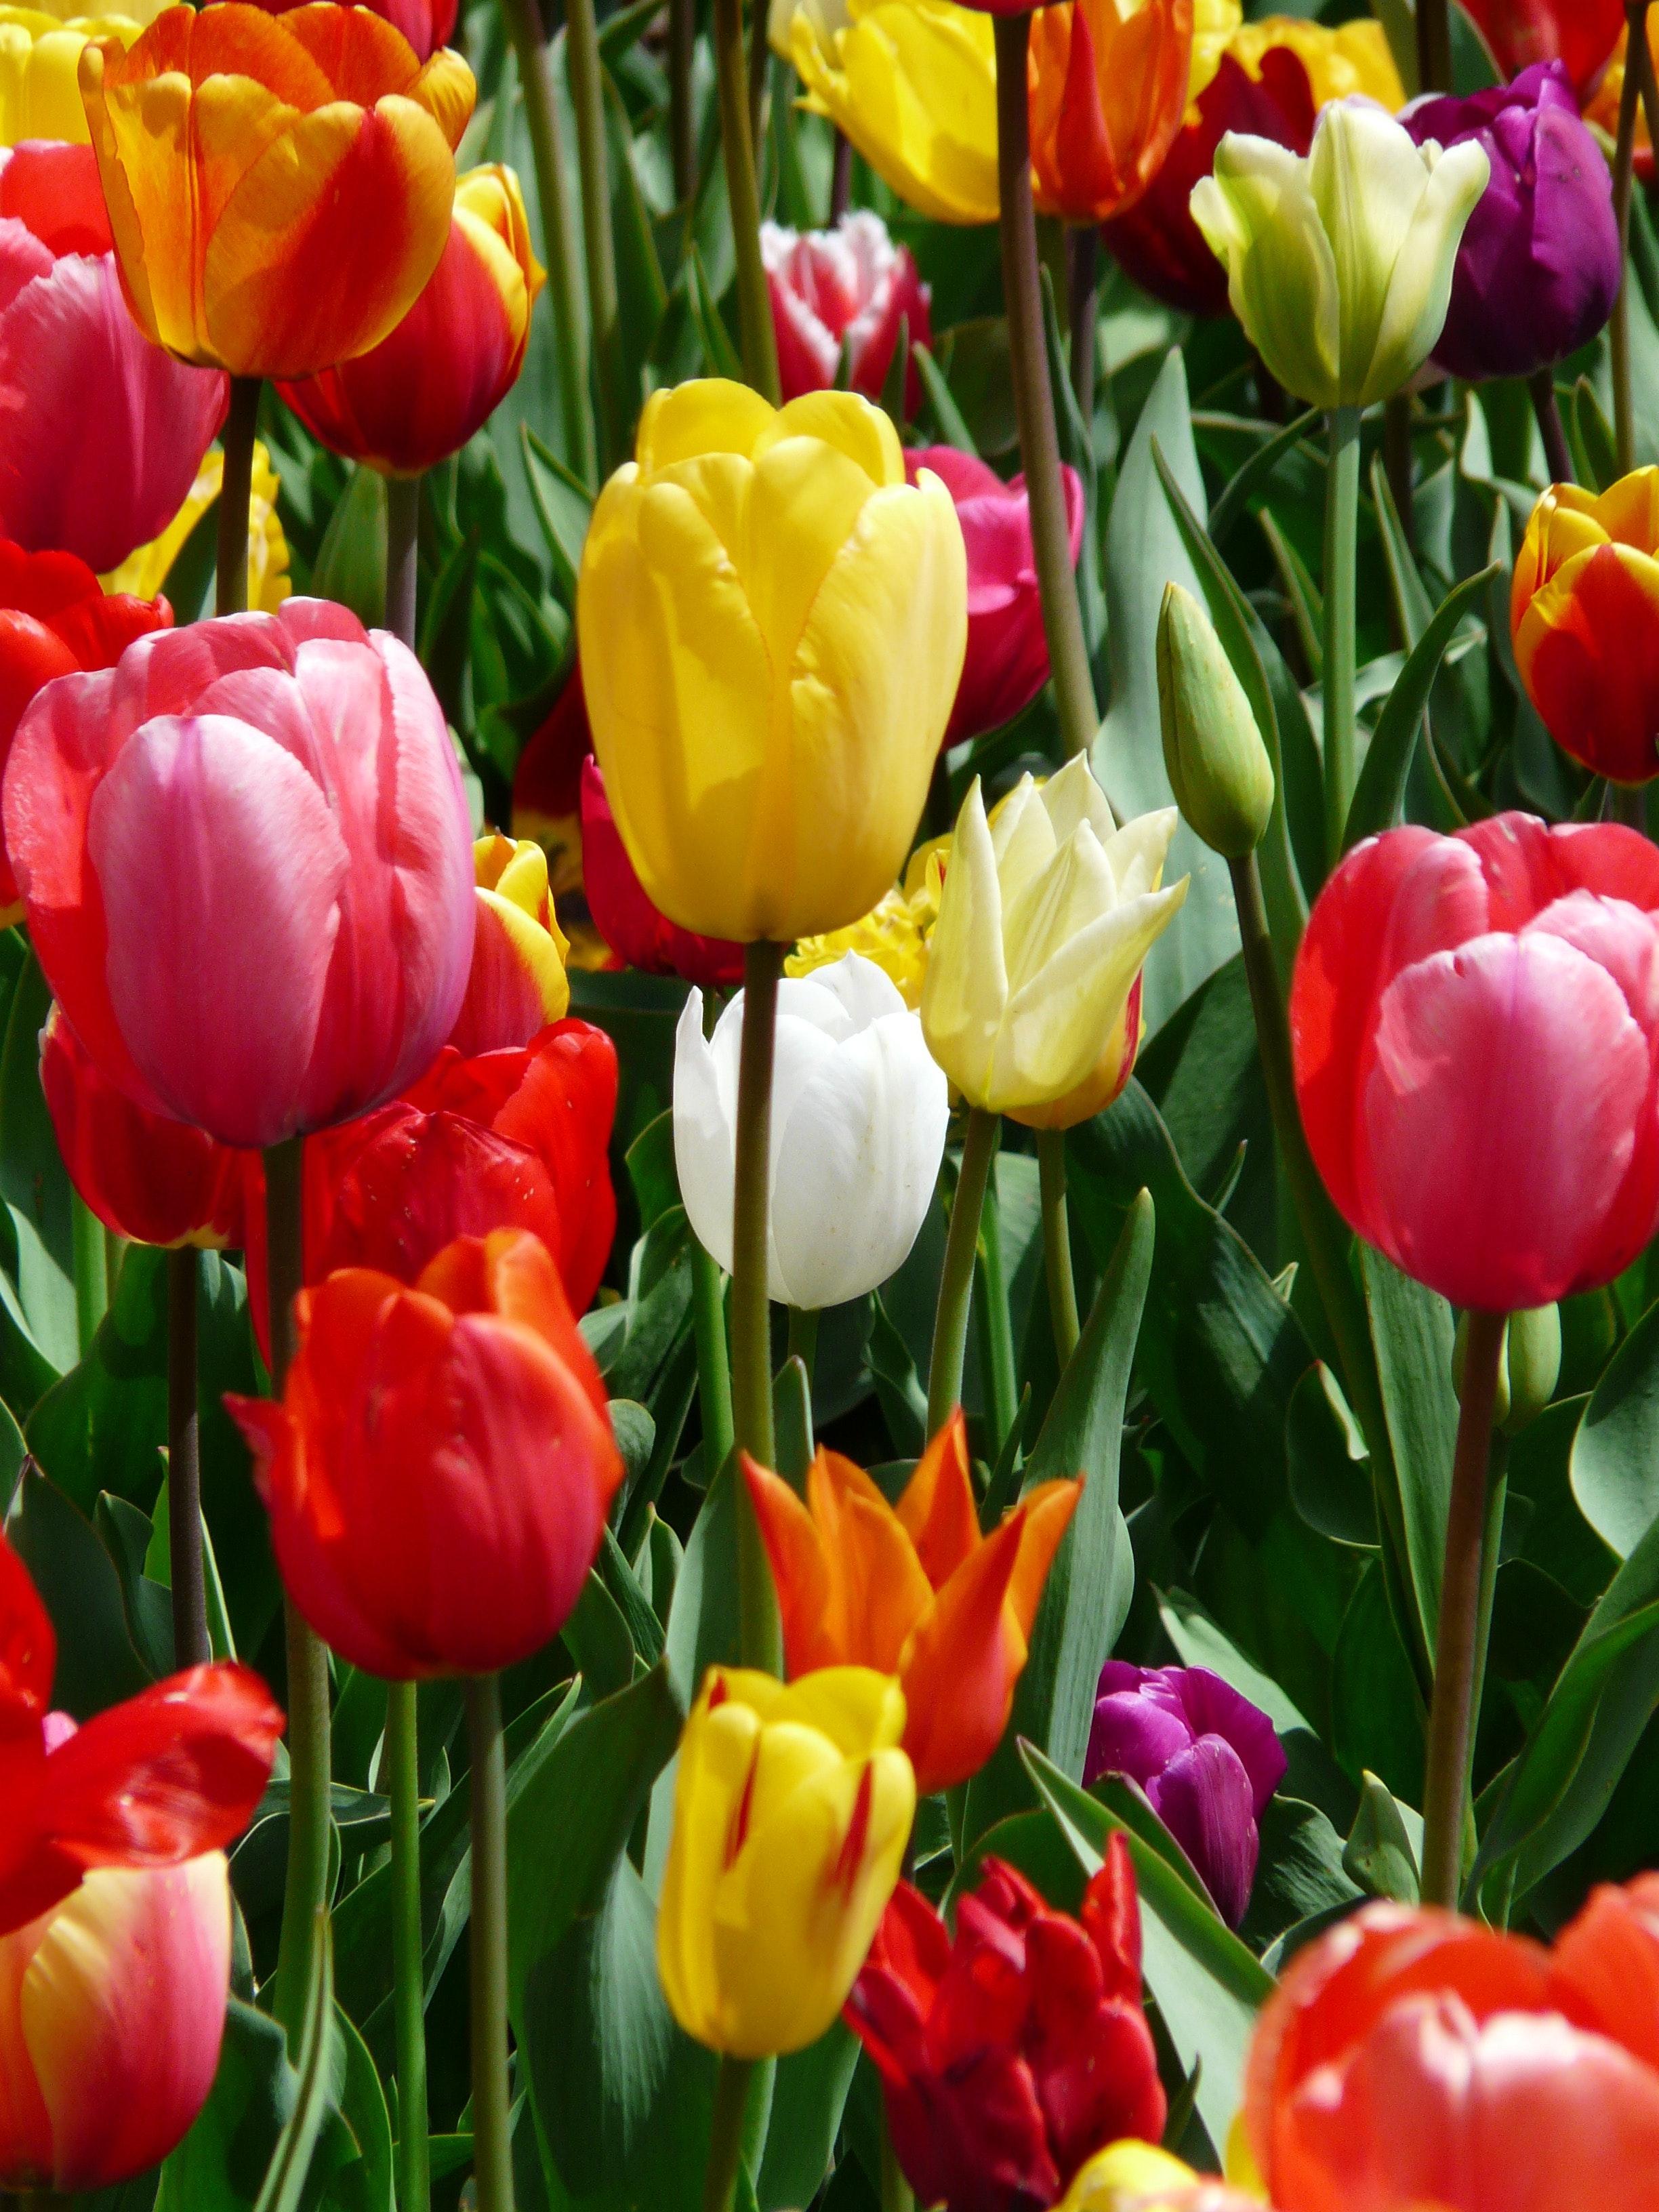 Red Purple And Yellow Tulip Fields 183 Free Stock Photo